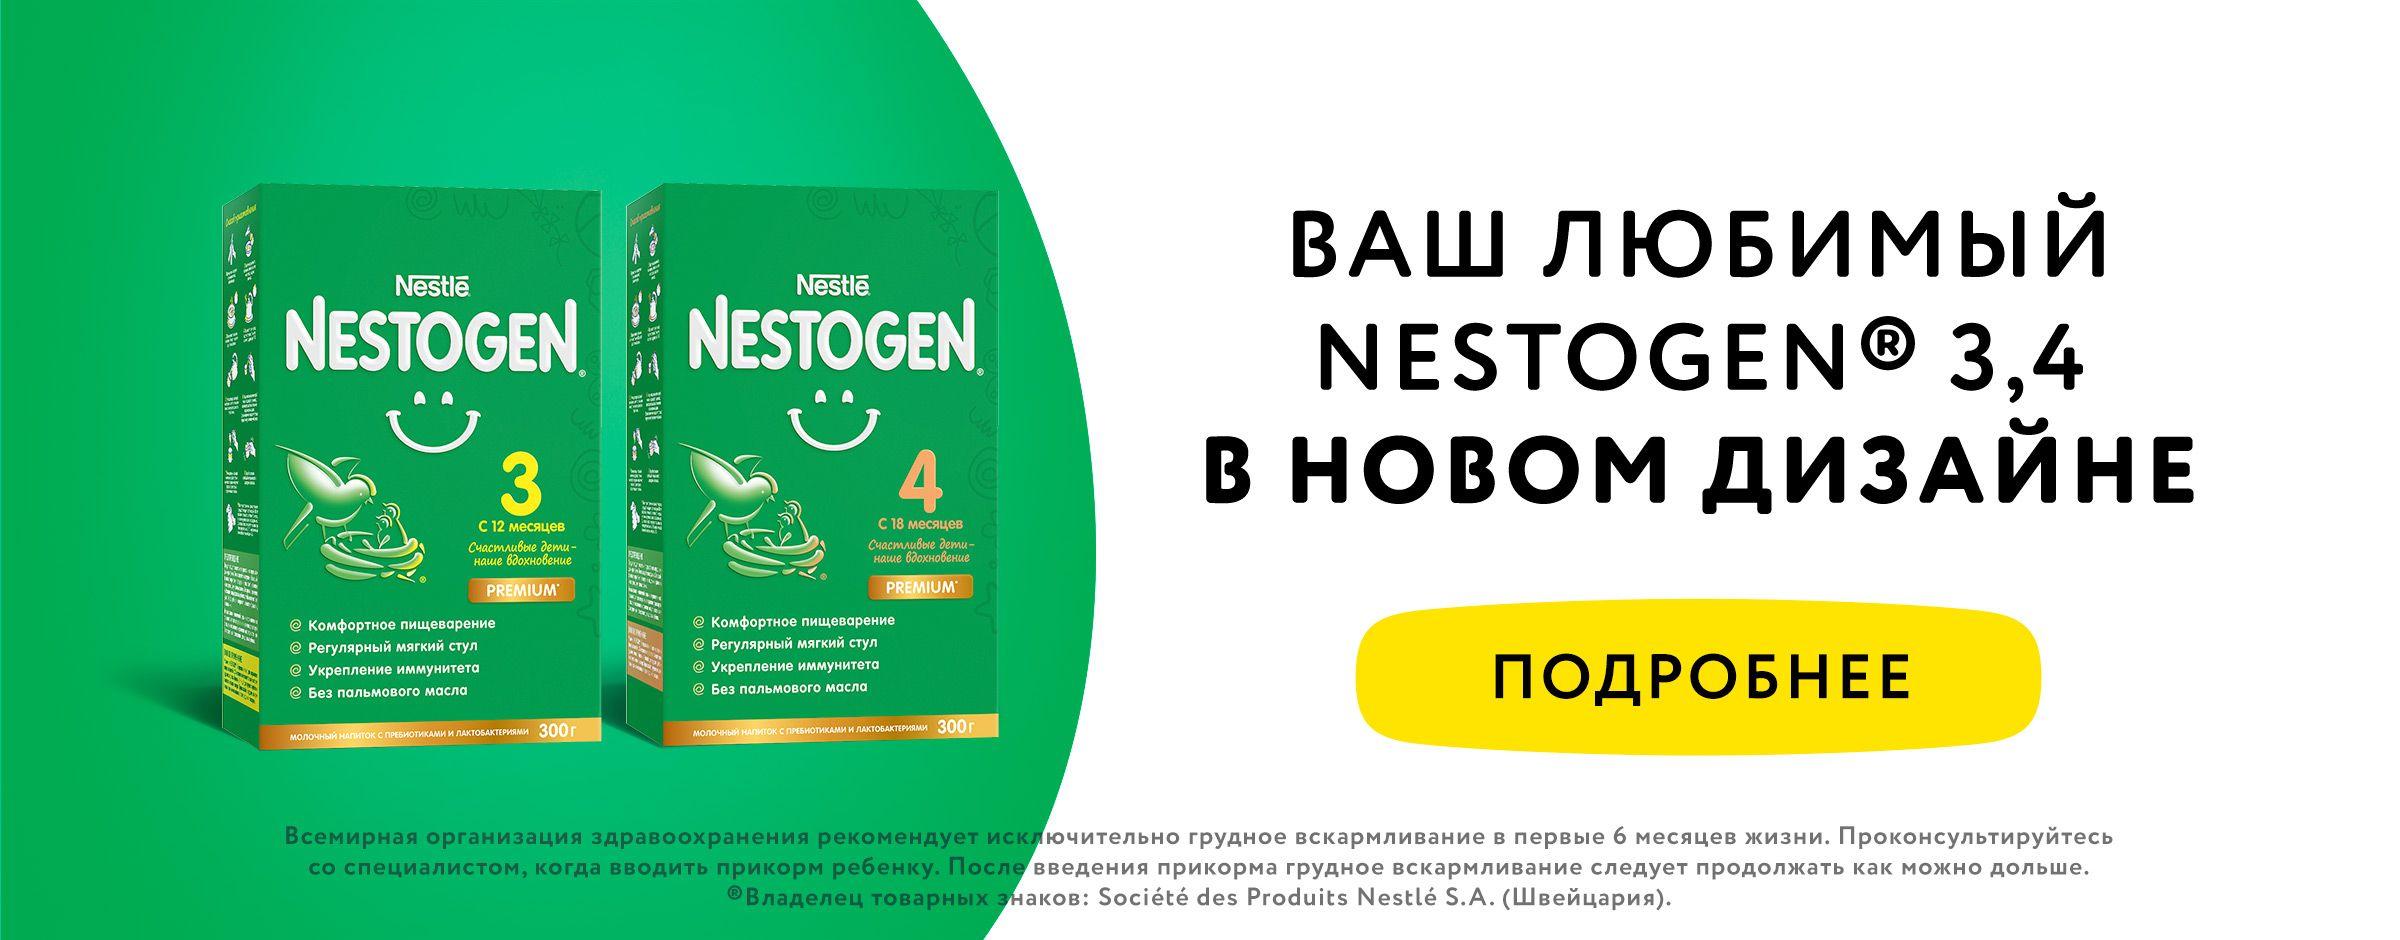 Nestogen новый дизайн